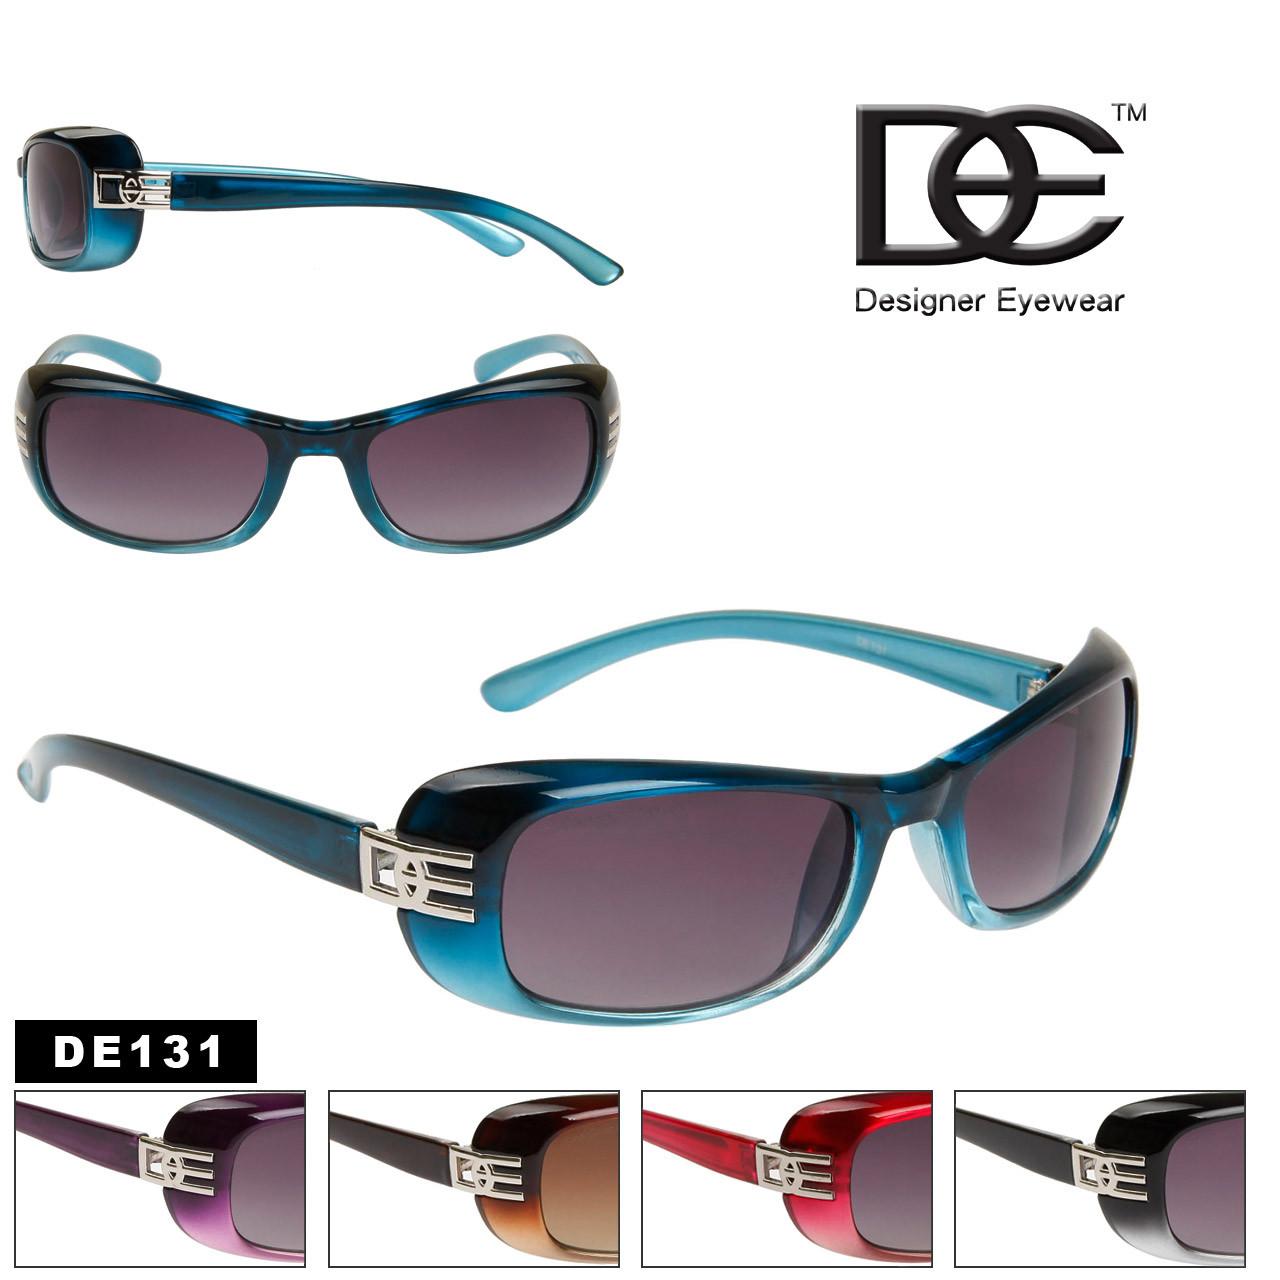 DE131 Women's Fashion Sunglasses